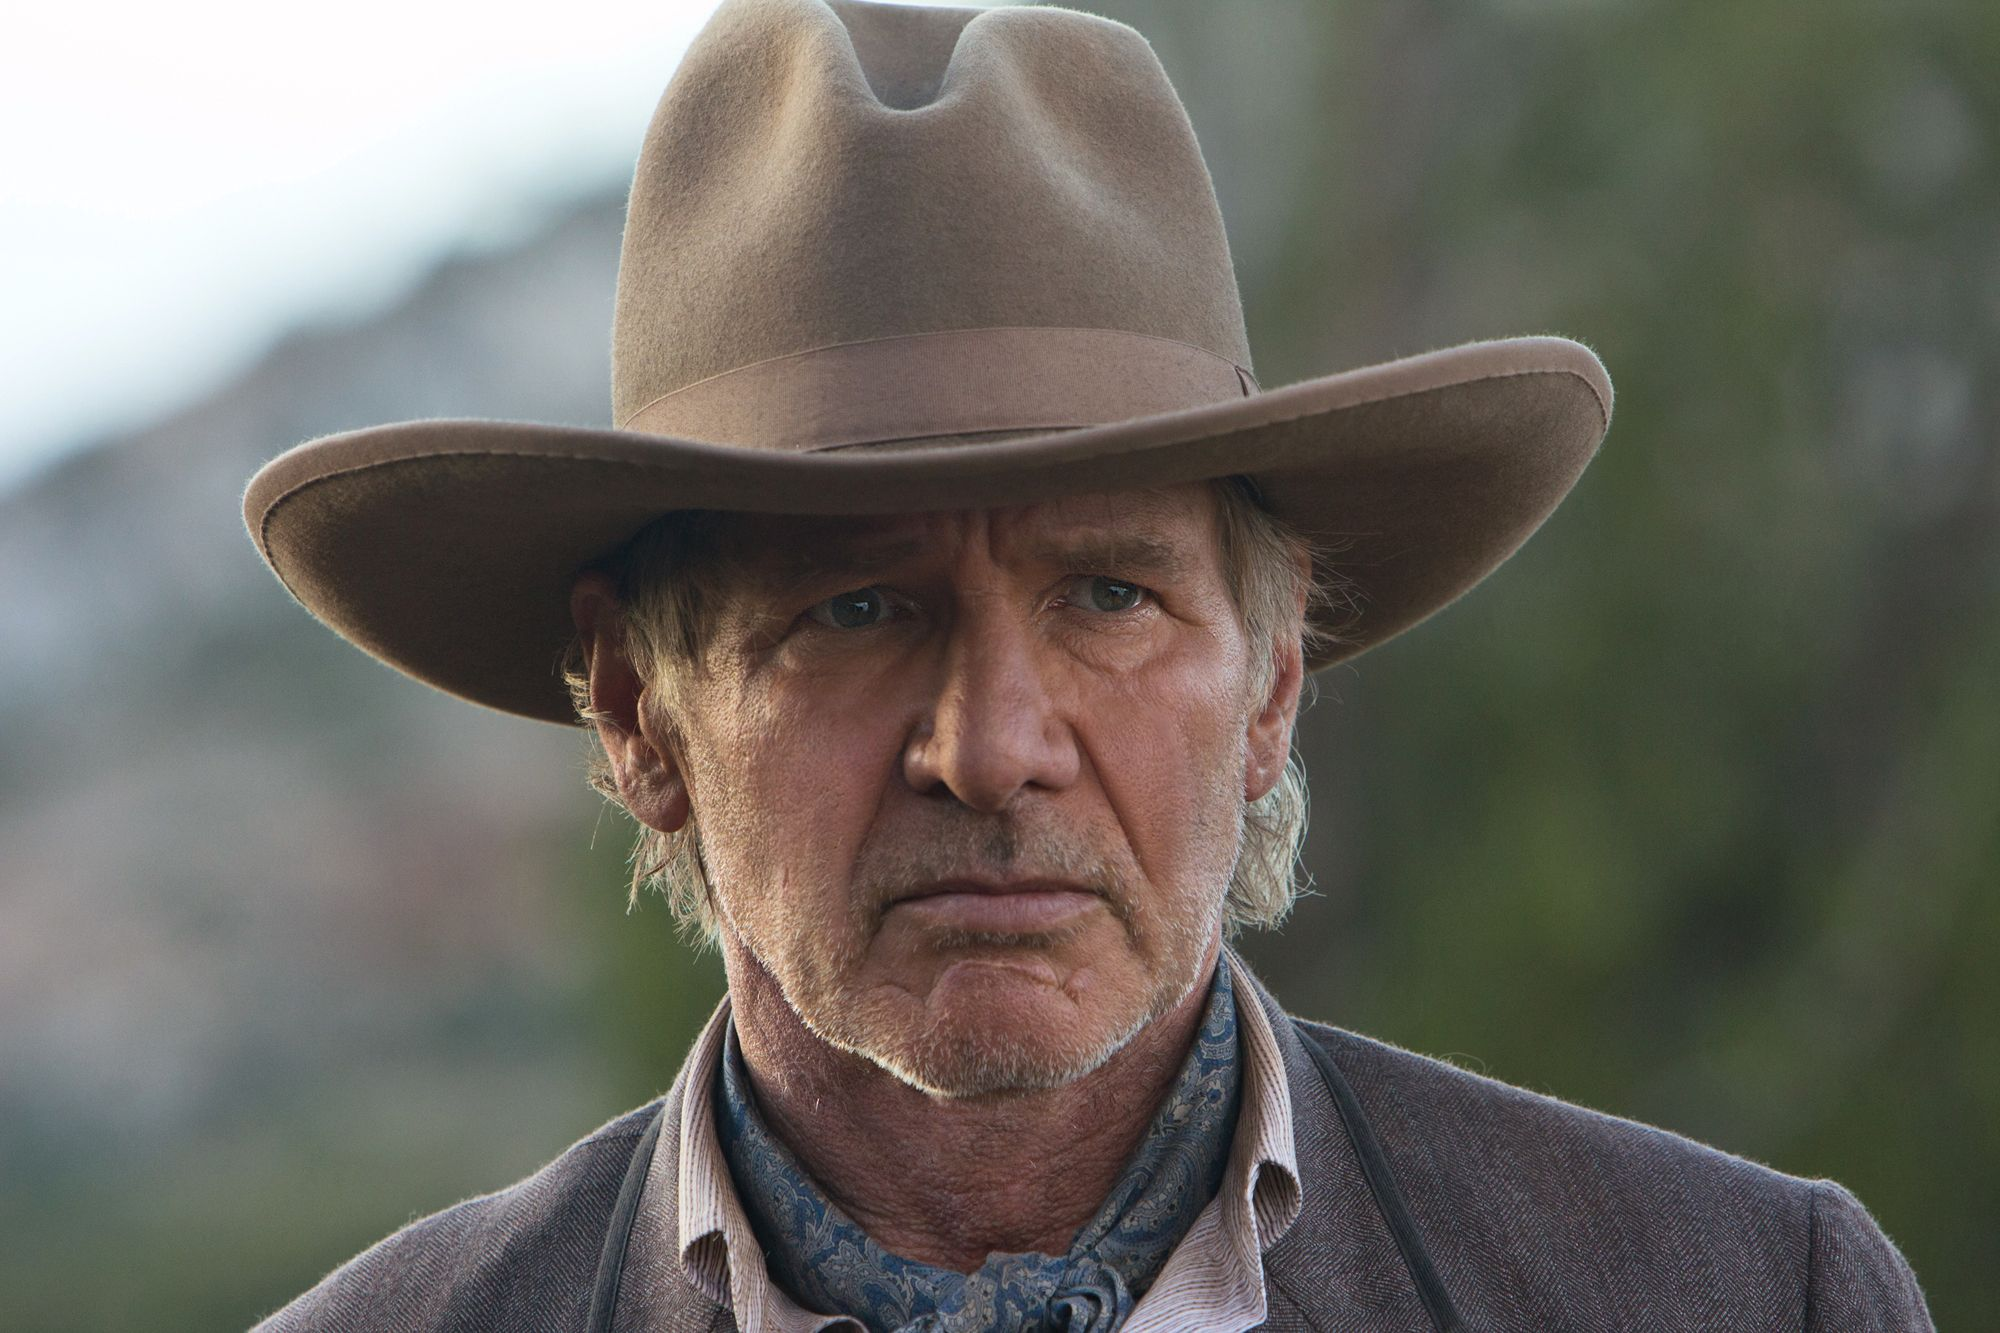 Cowboys aliens movie images daniel craig harrison ford for The harrison